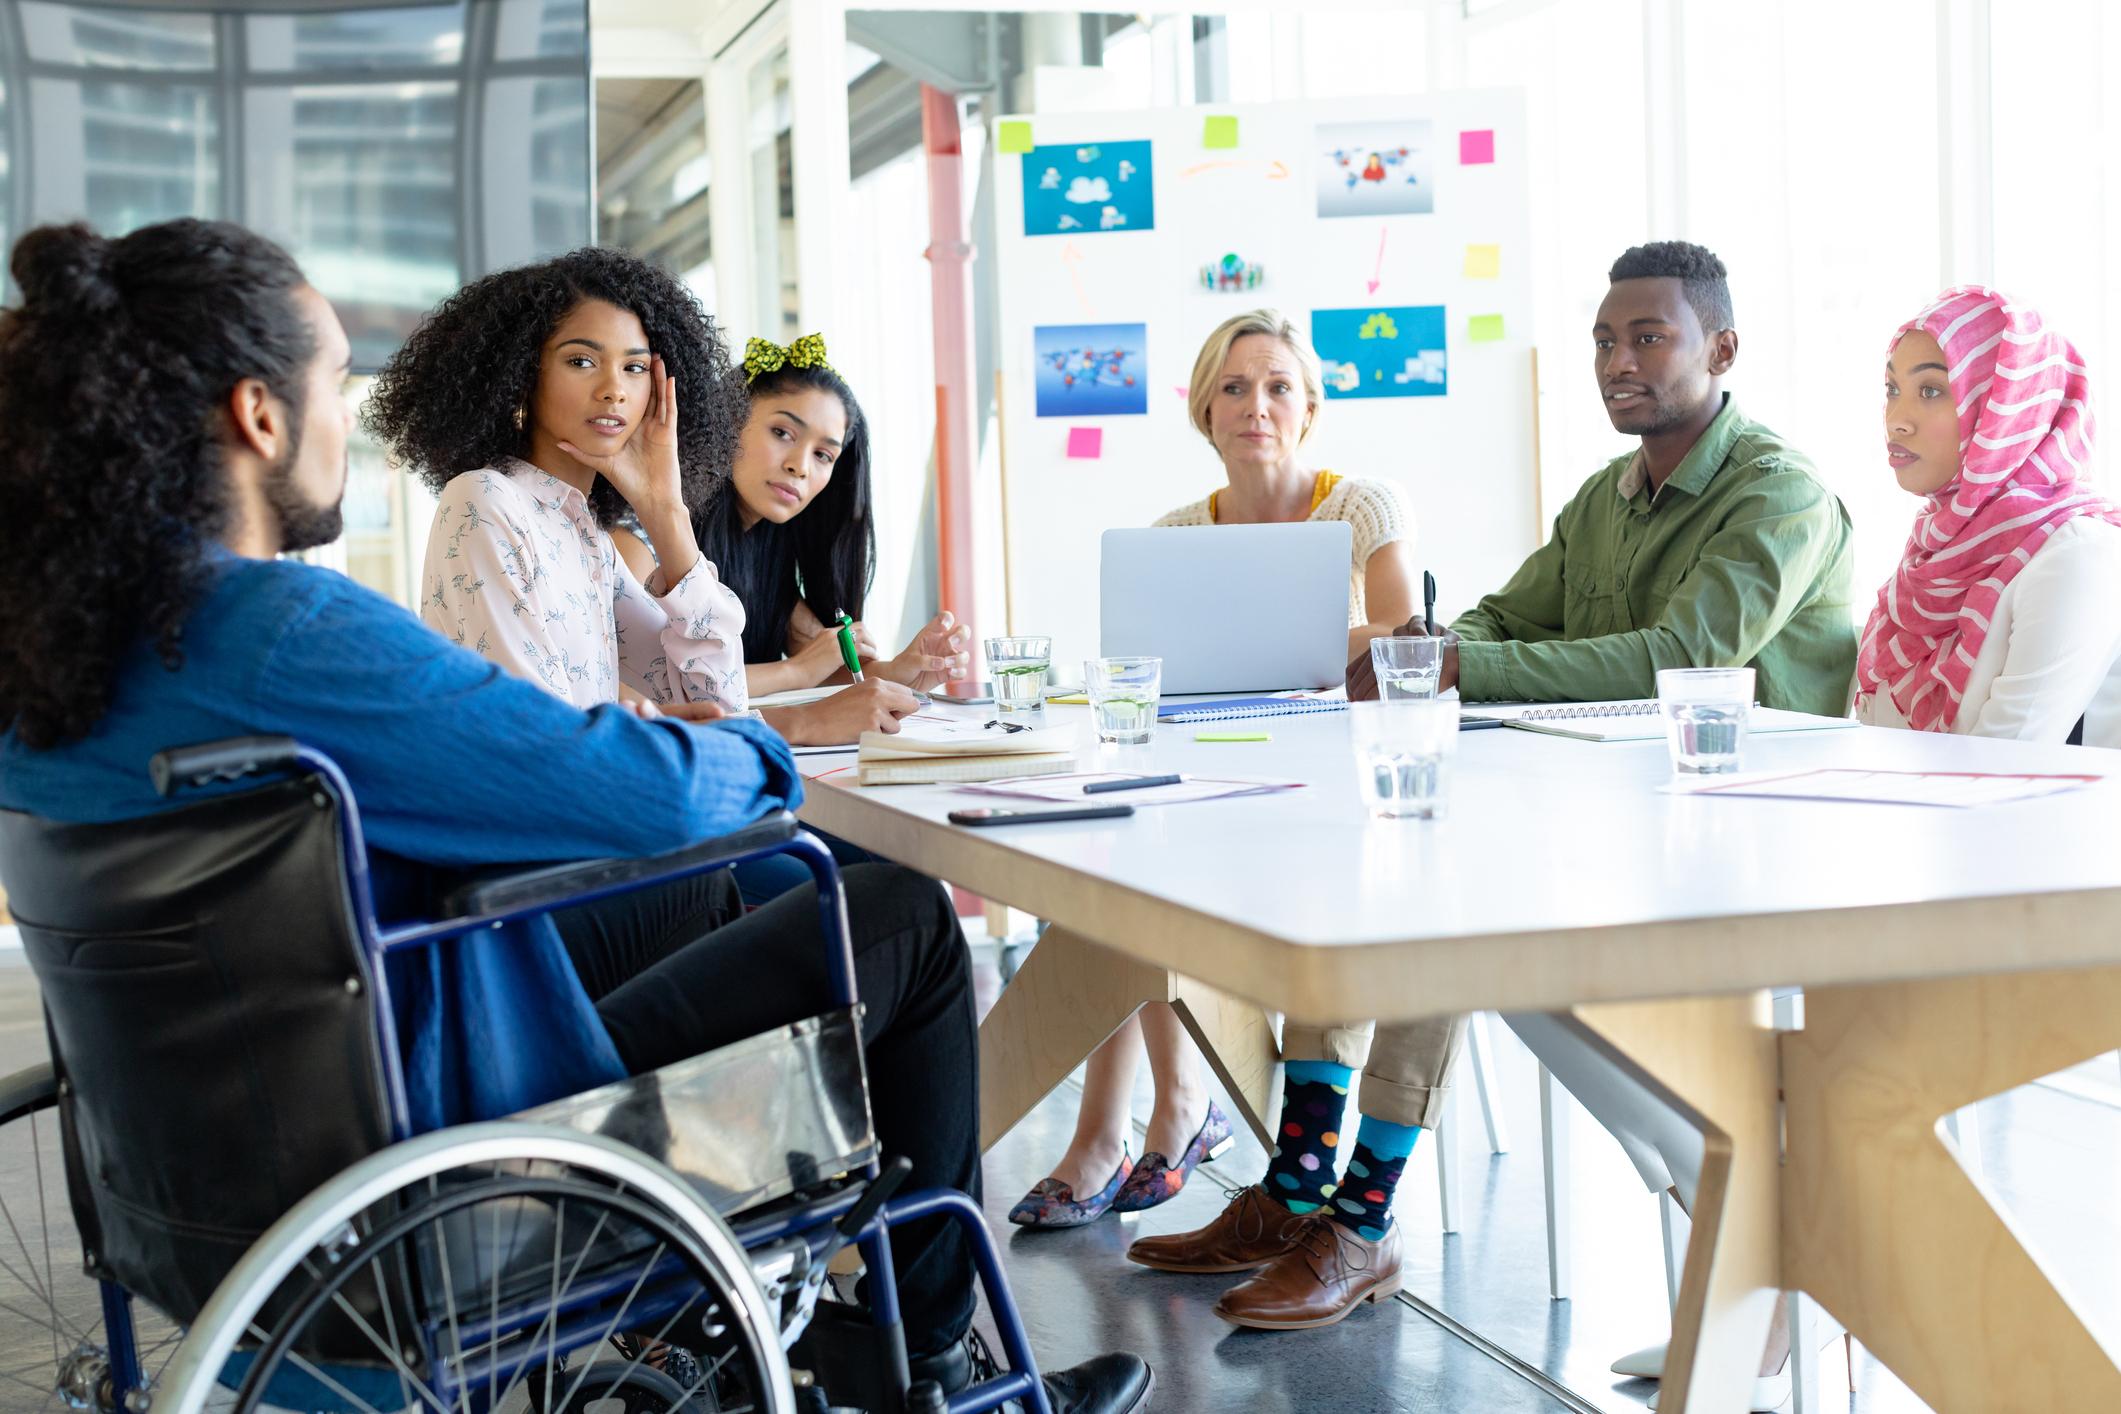 Managing Diverse Project Teams Requires Diverse Skills